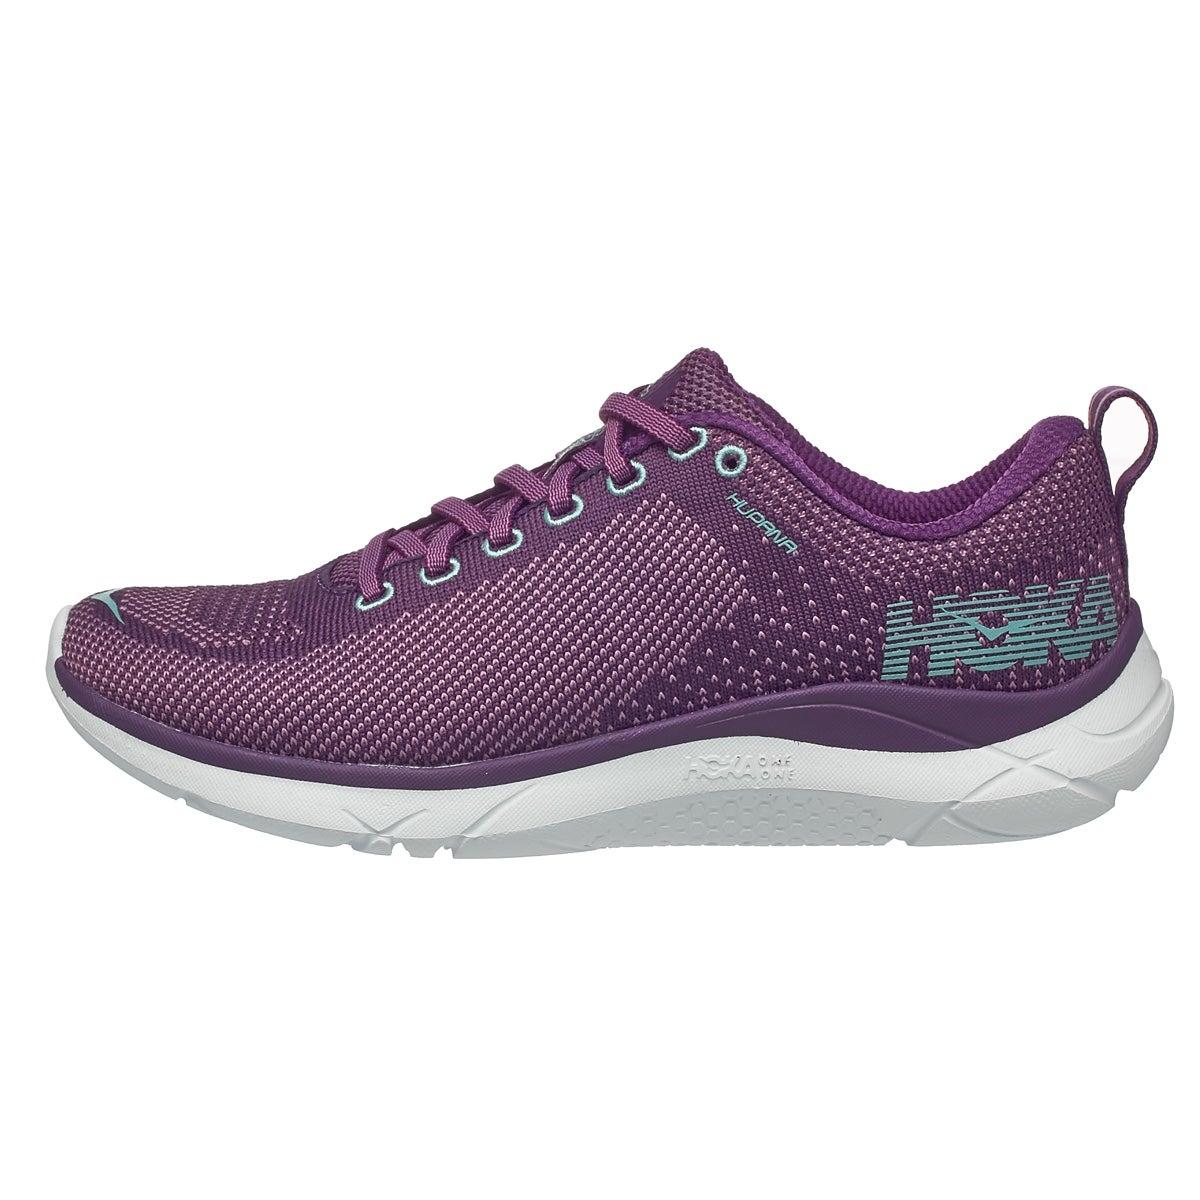 Plum Running Shoes